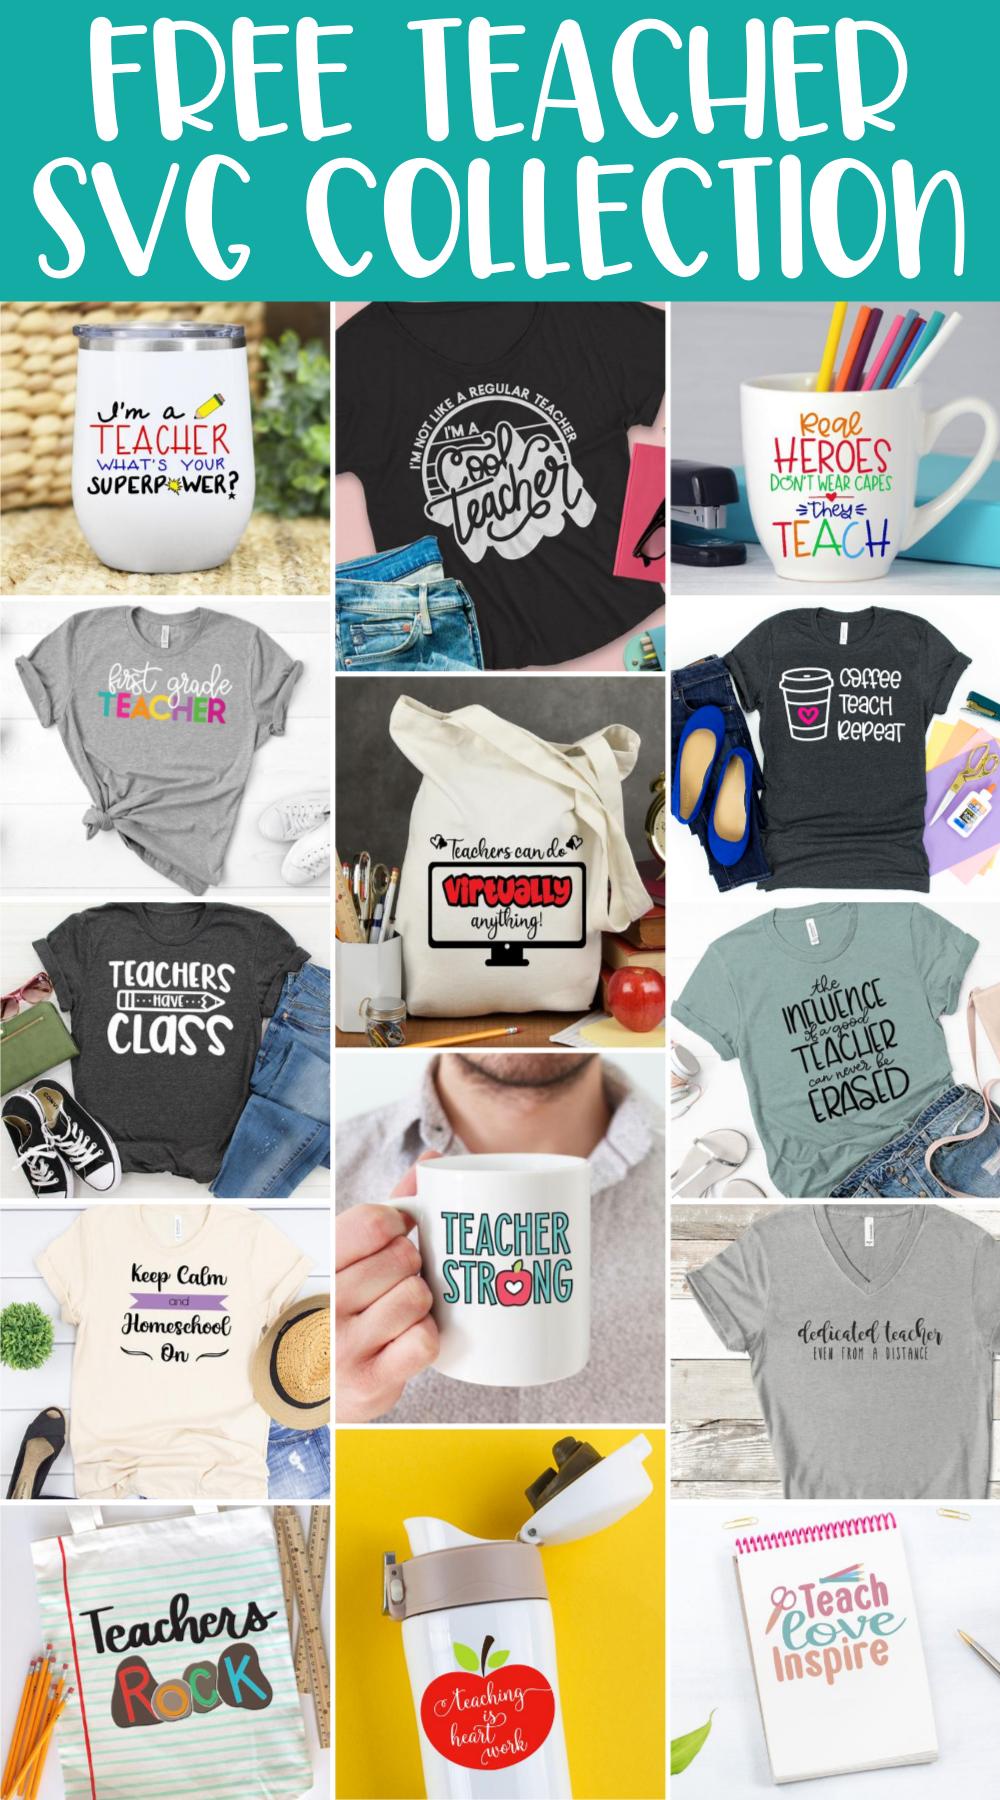 Free Teacher SVG Collection